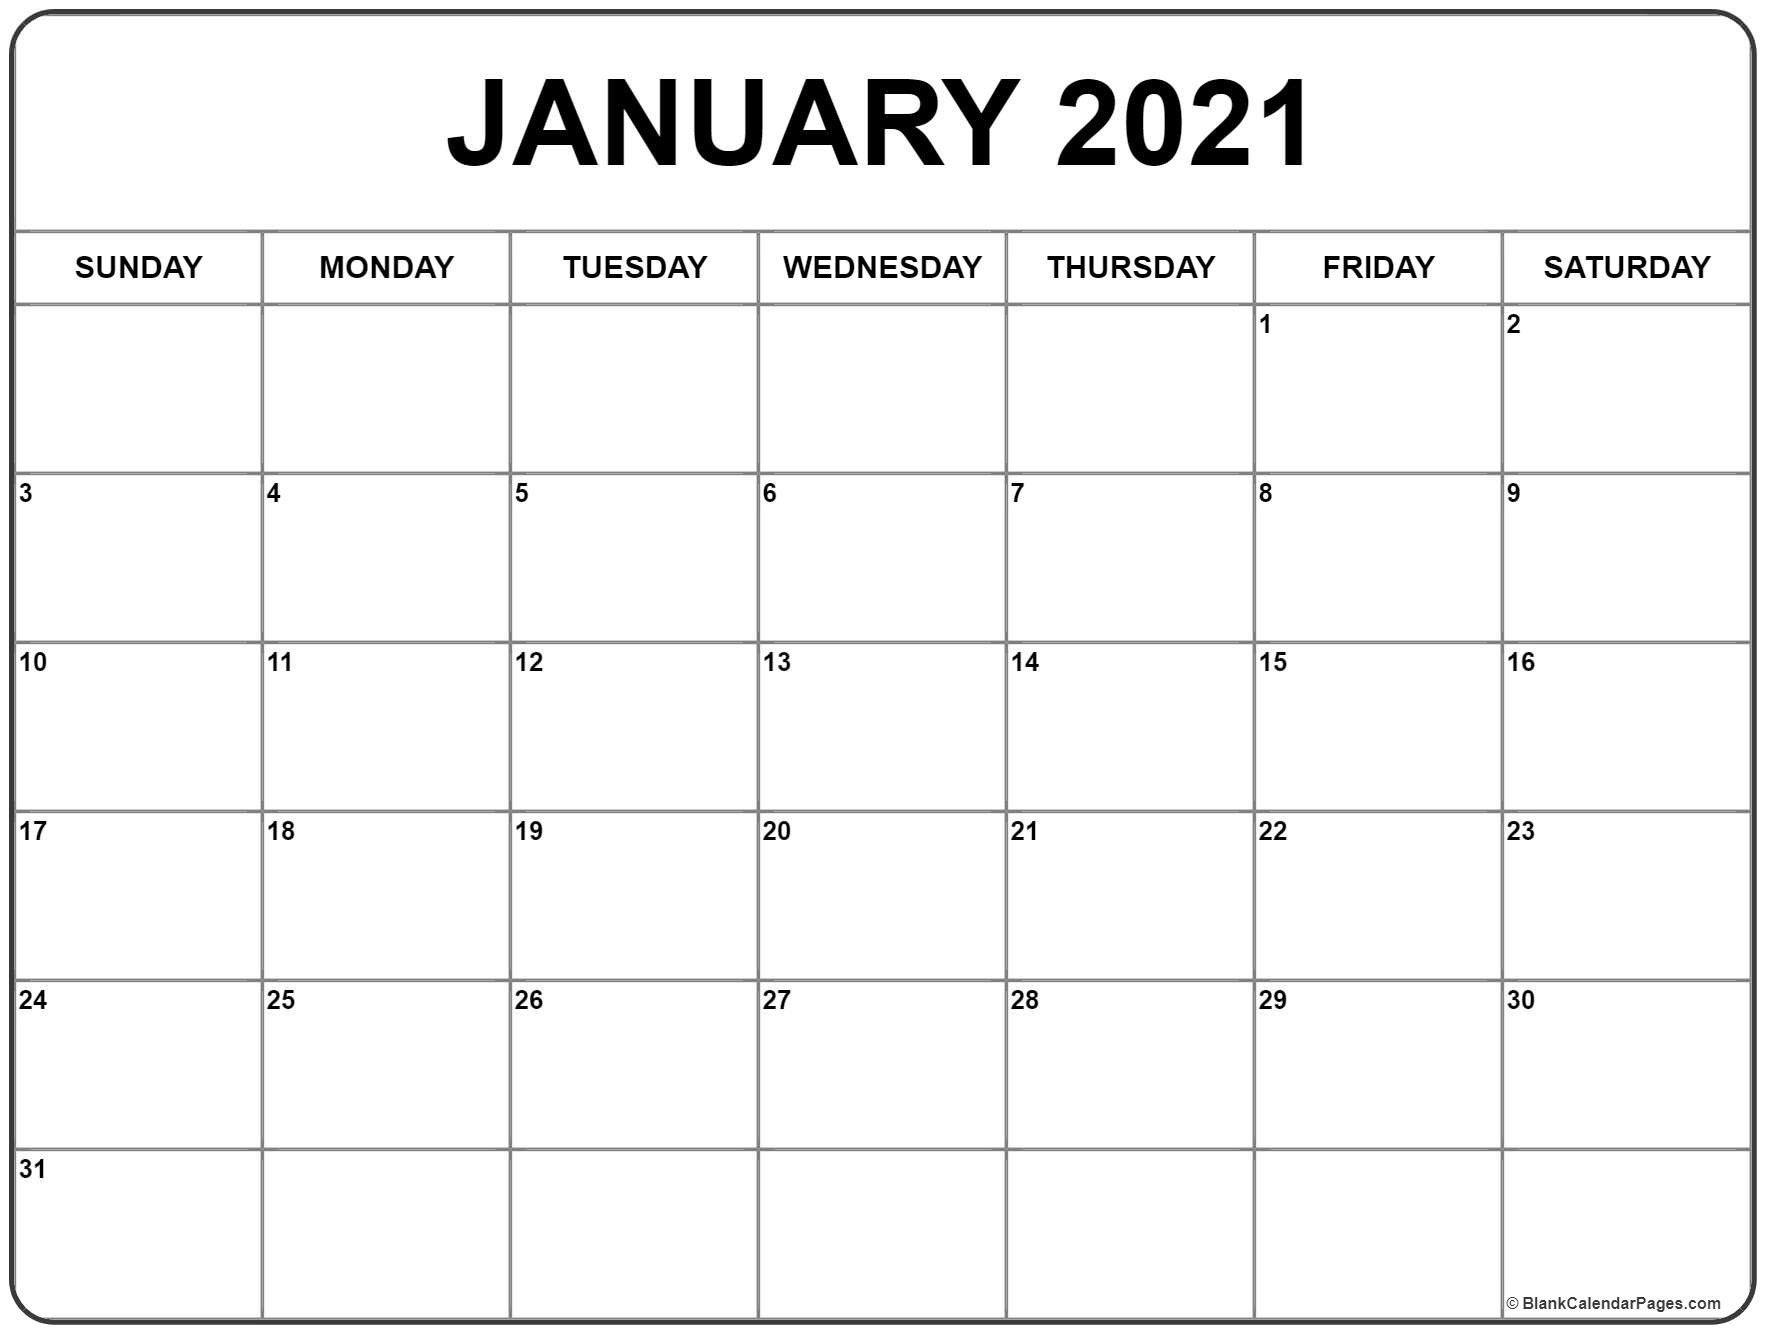 January 2021 Calendar Printable In 2020 Monthly Calendar